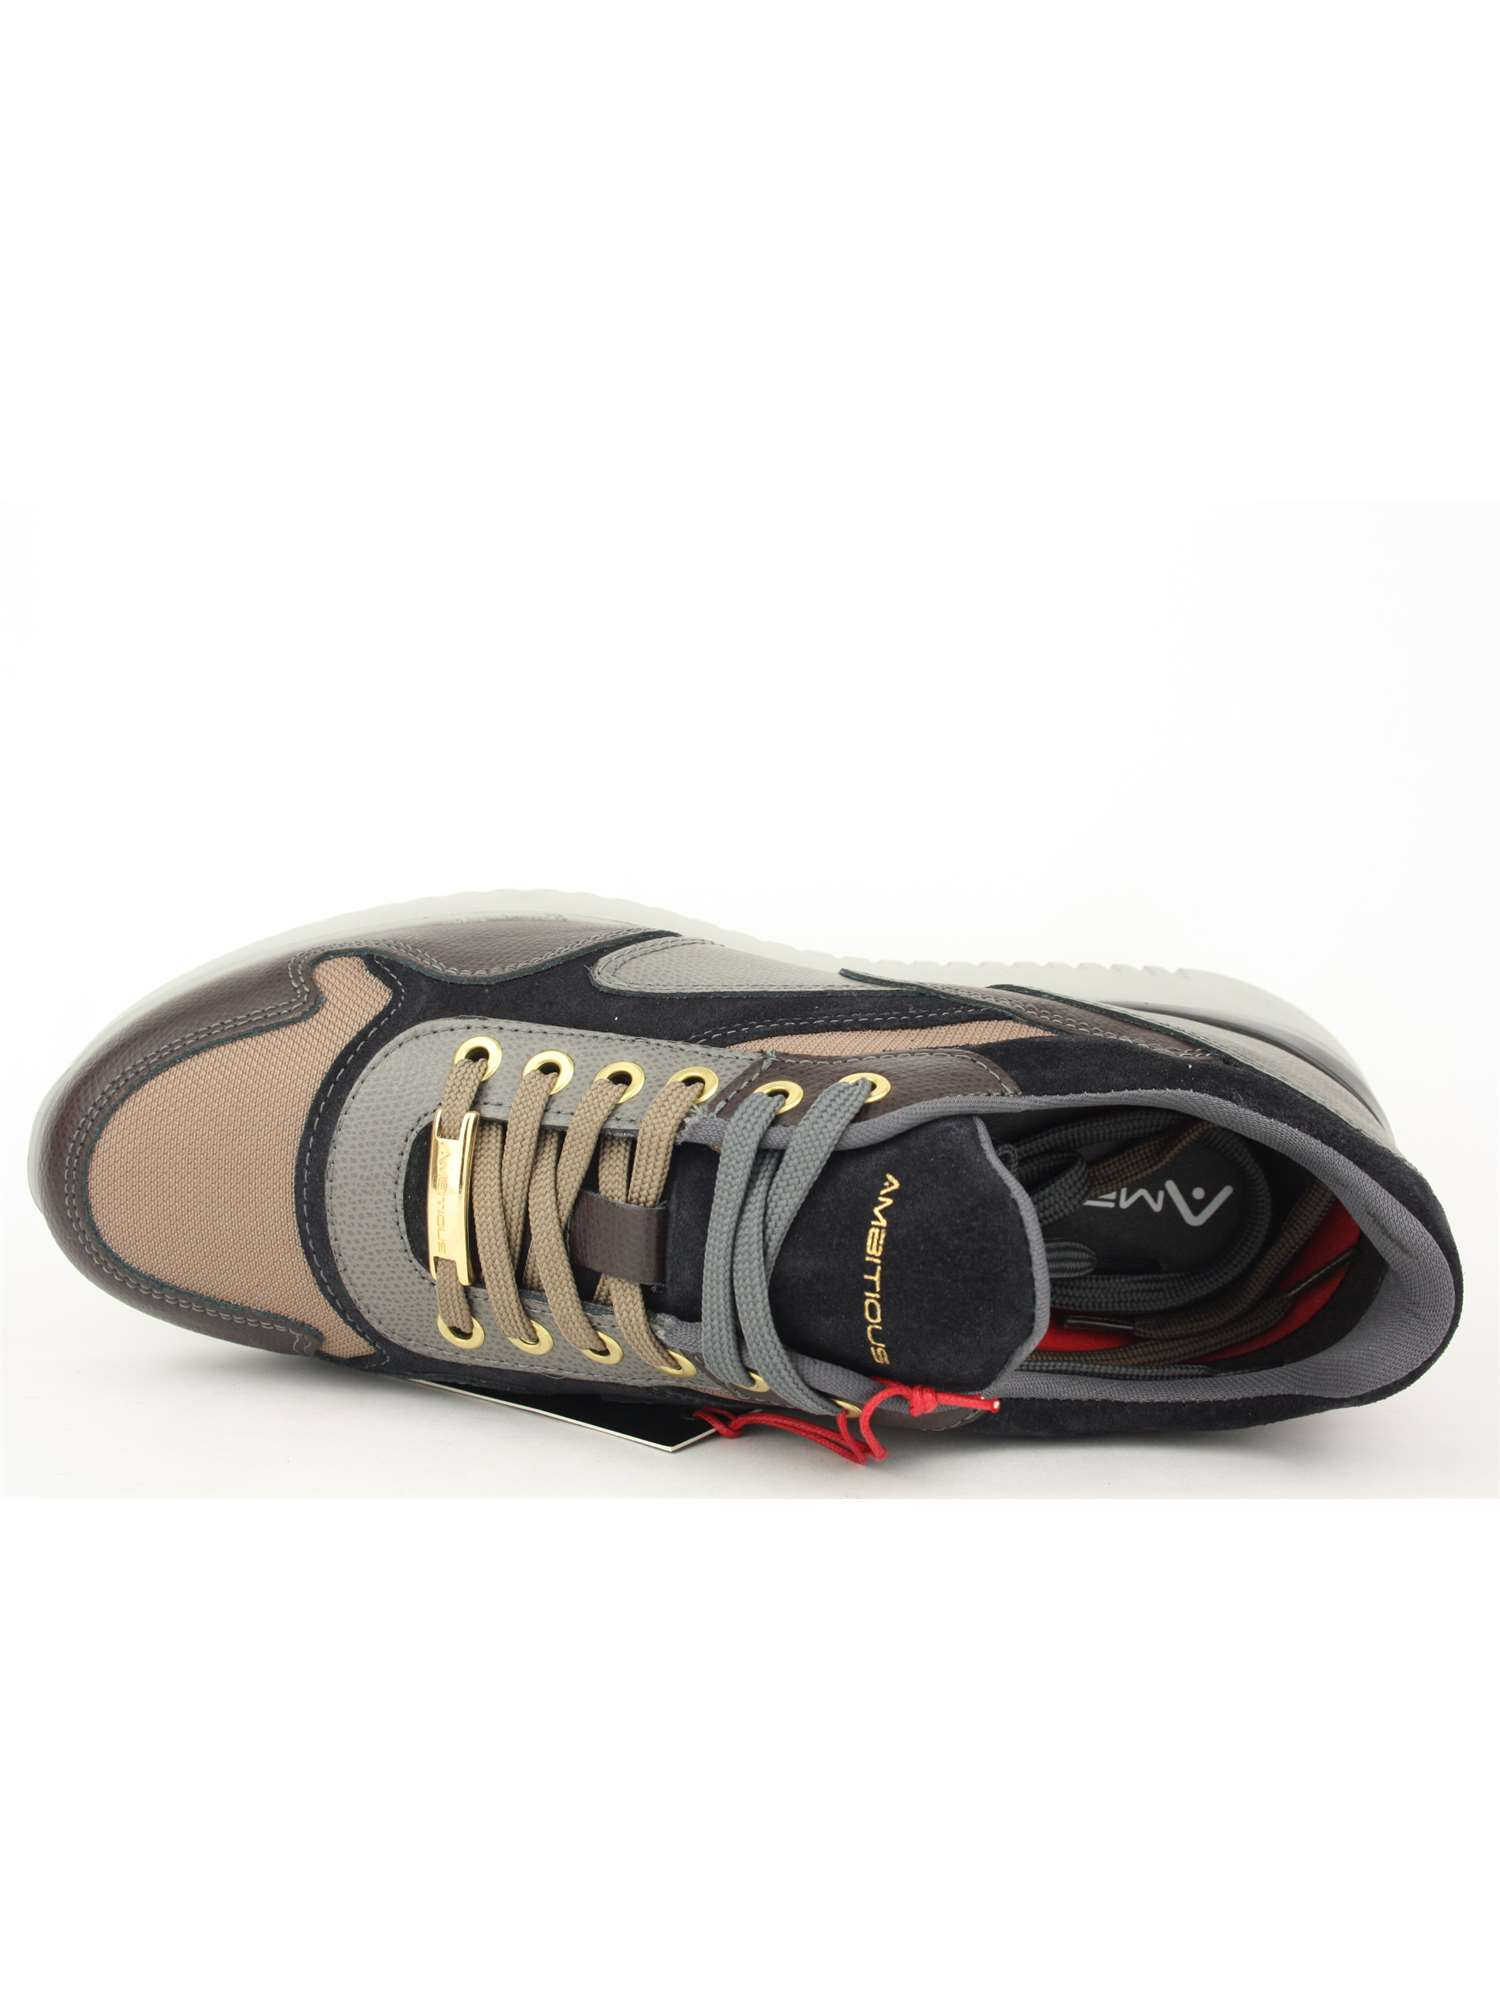 Ambitious Shoes Sneakers Bicolore  f1c3188df2e